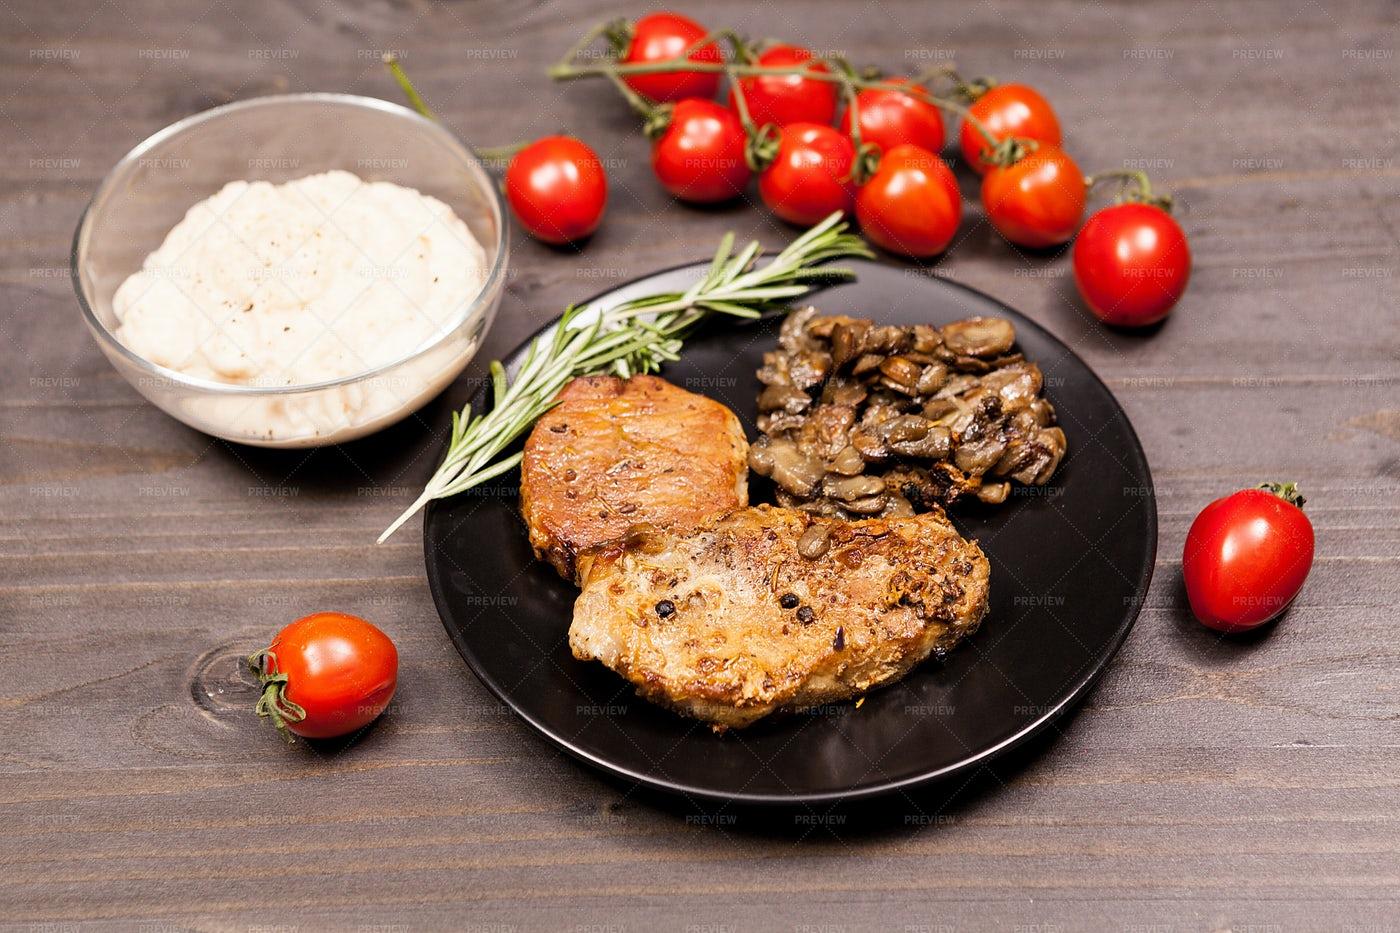 Pork And Mushroom Plate: Stock Photos